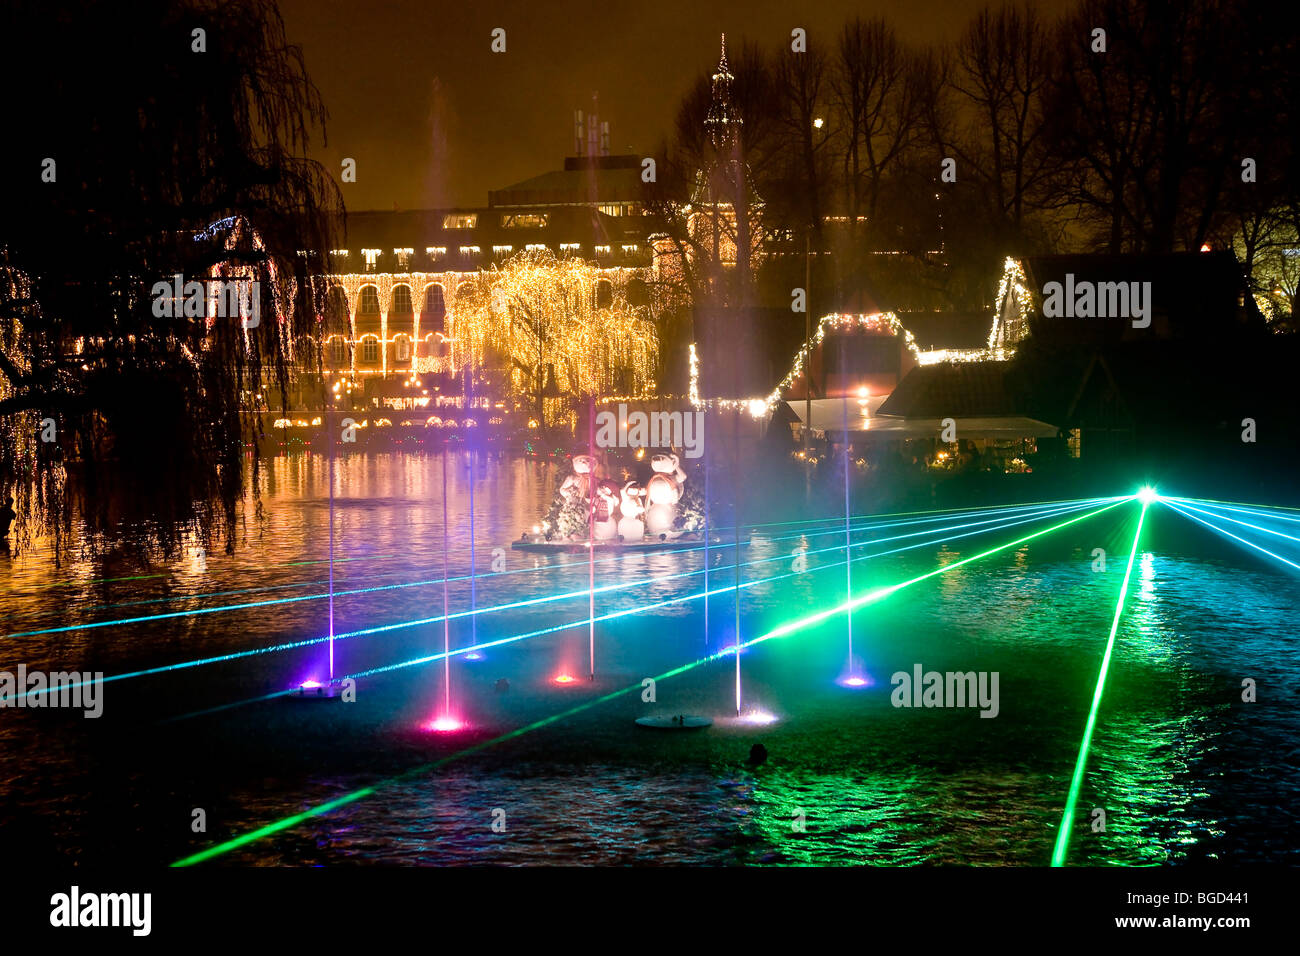 Illumination show at the Tivoli Lake in Copenhagen, Denmark, Europe - Stock Image